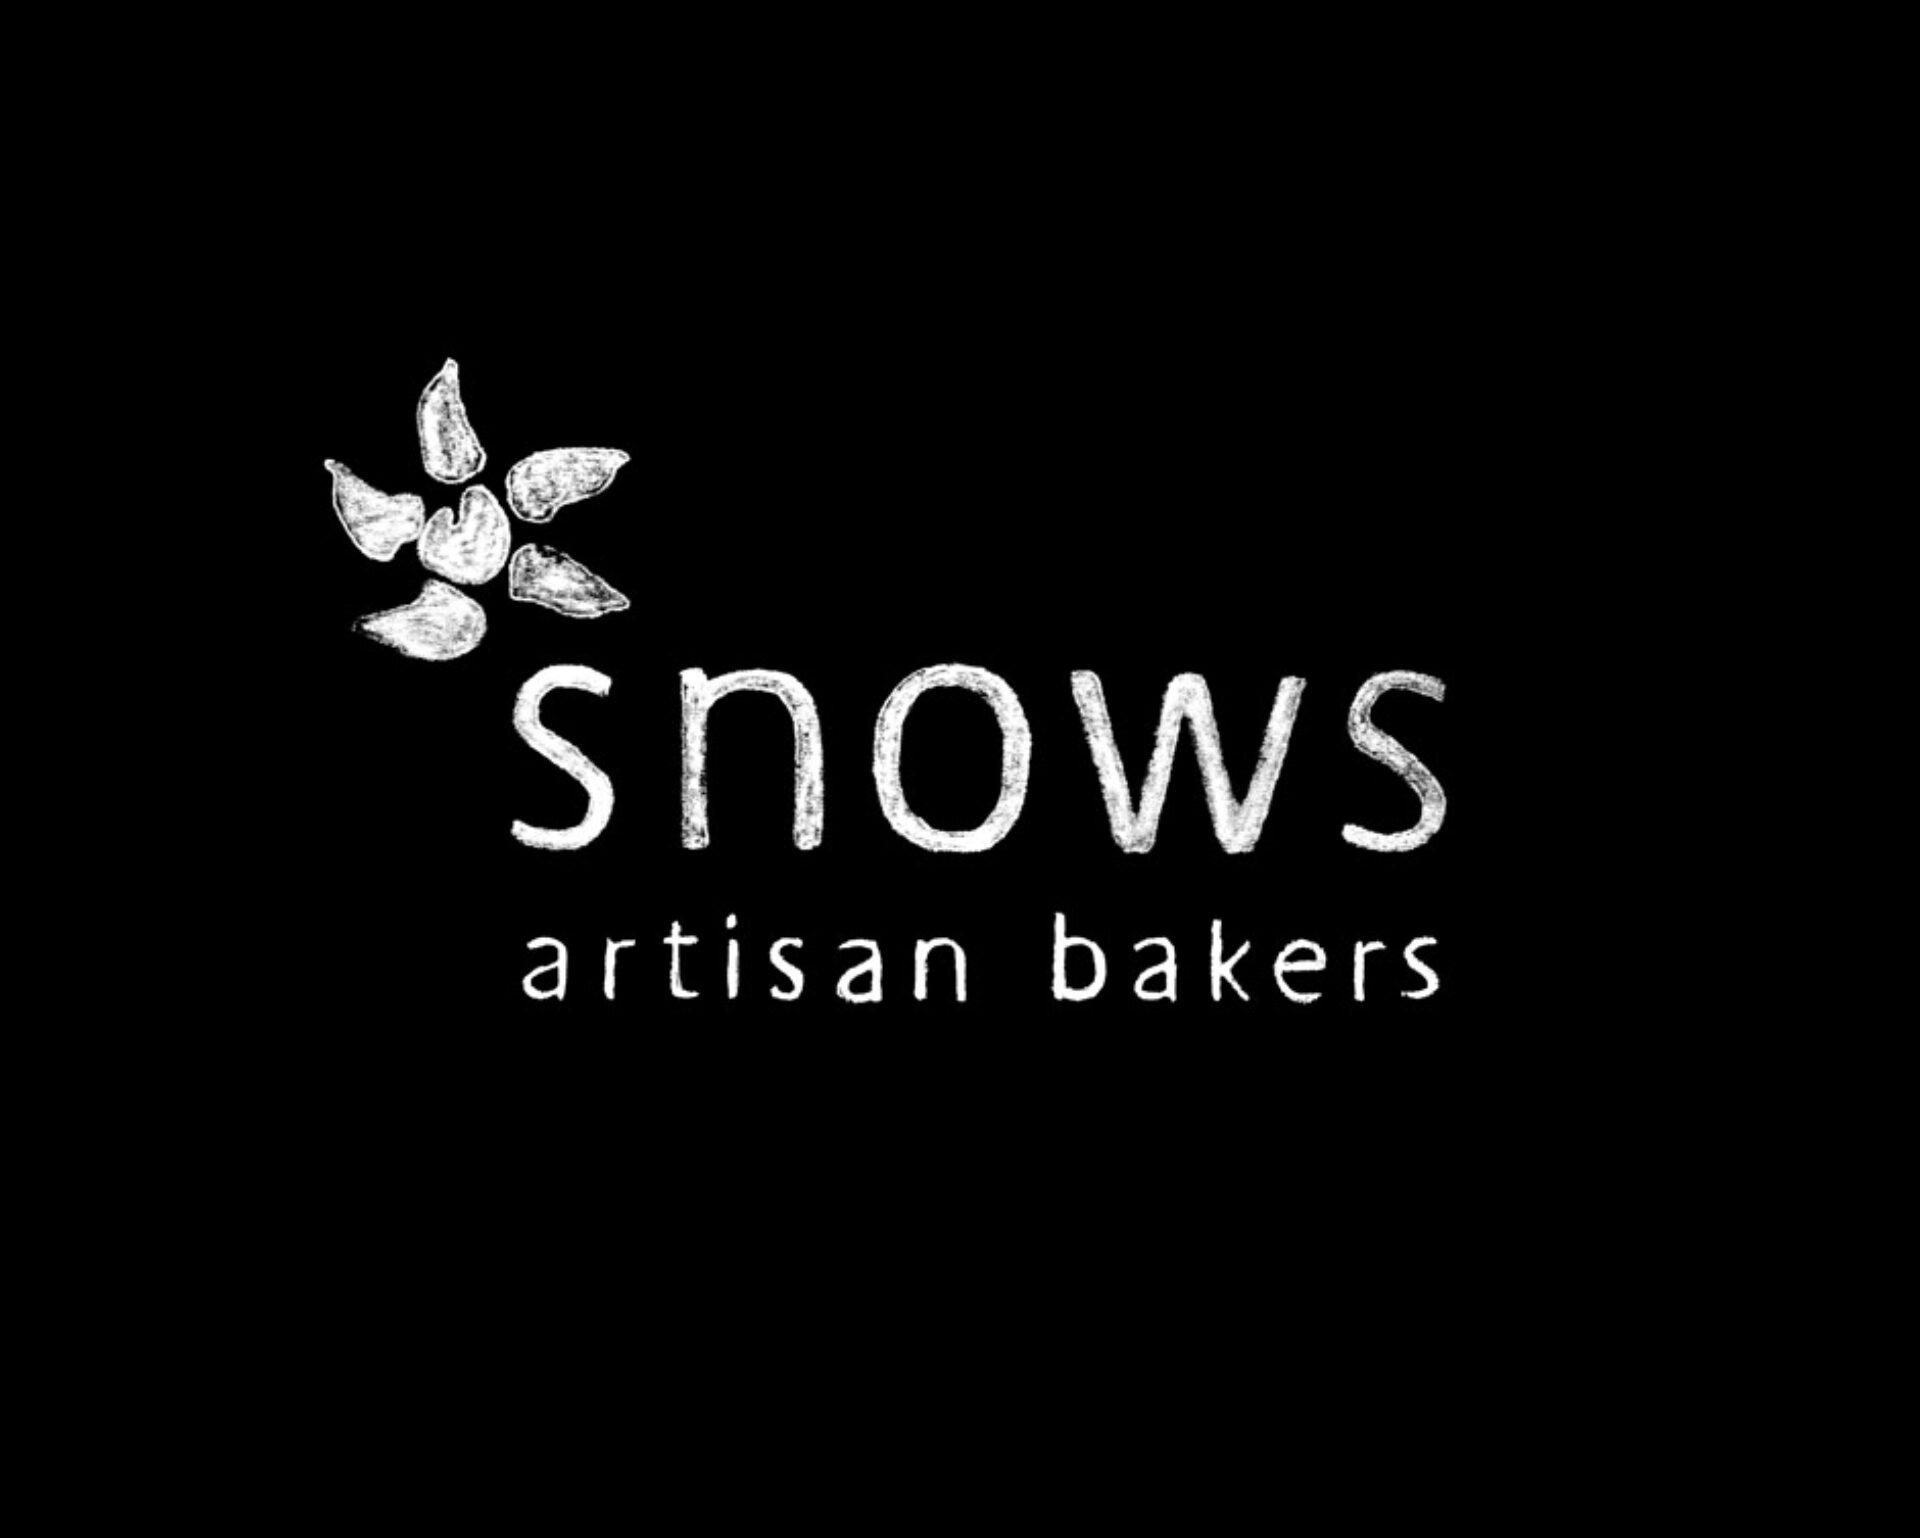 Snows artisan bakers 01